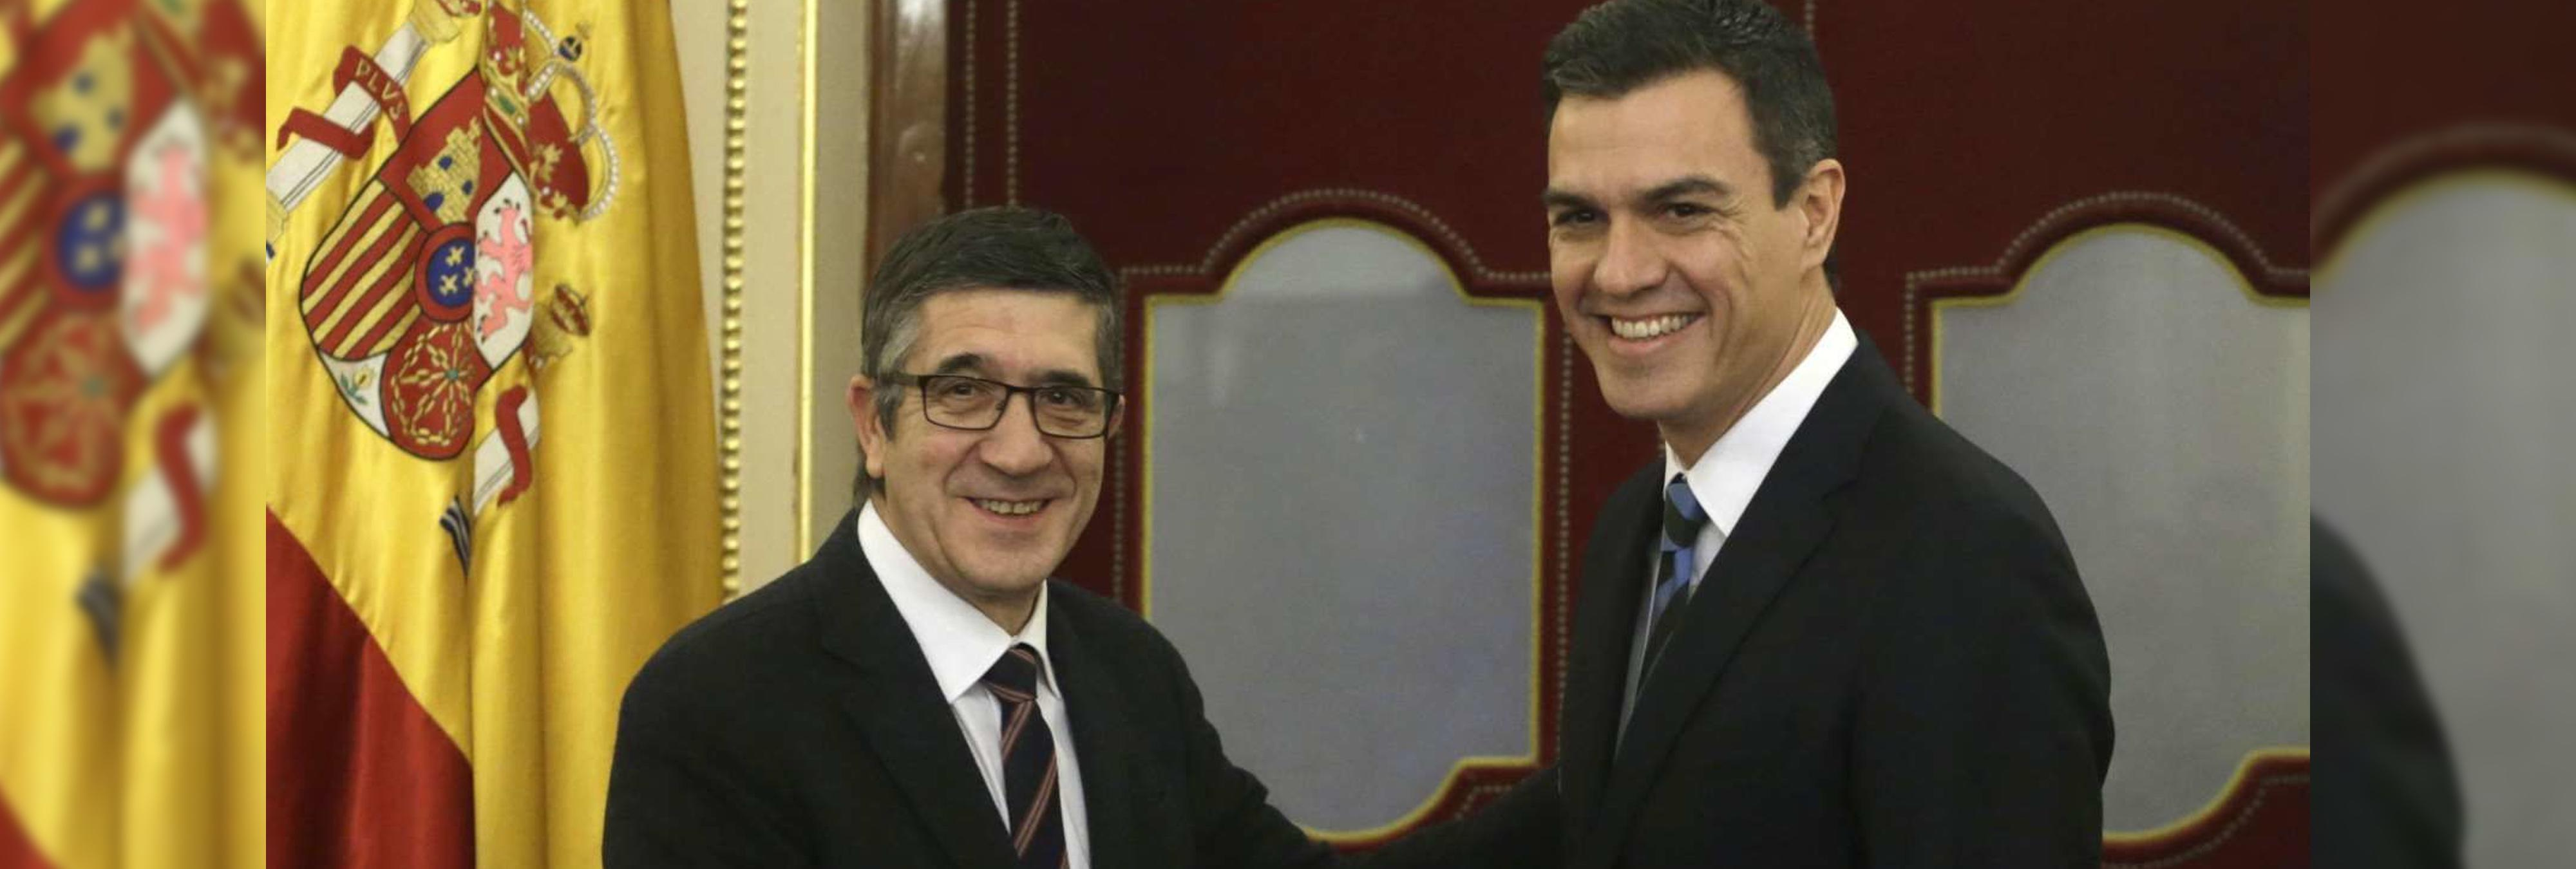 Patxi López rechaza unir su candidatura a Pedro Sánchez